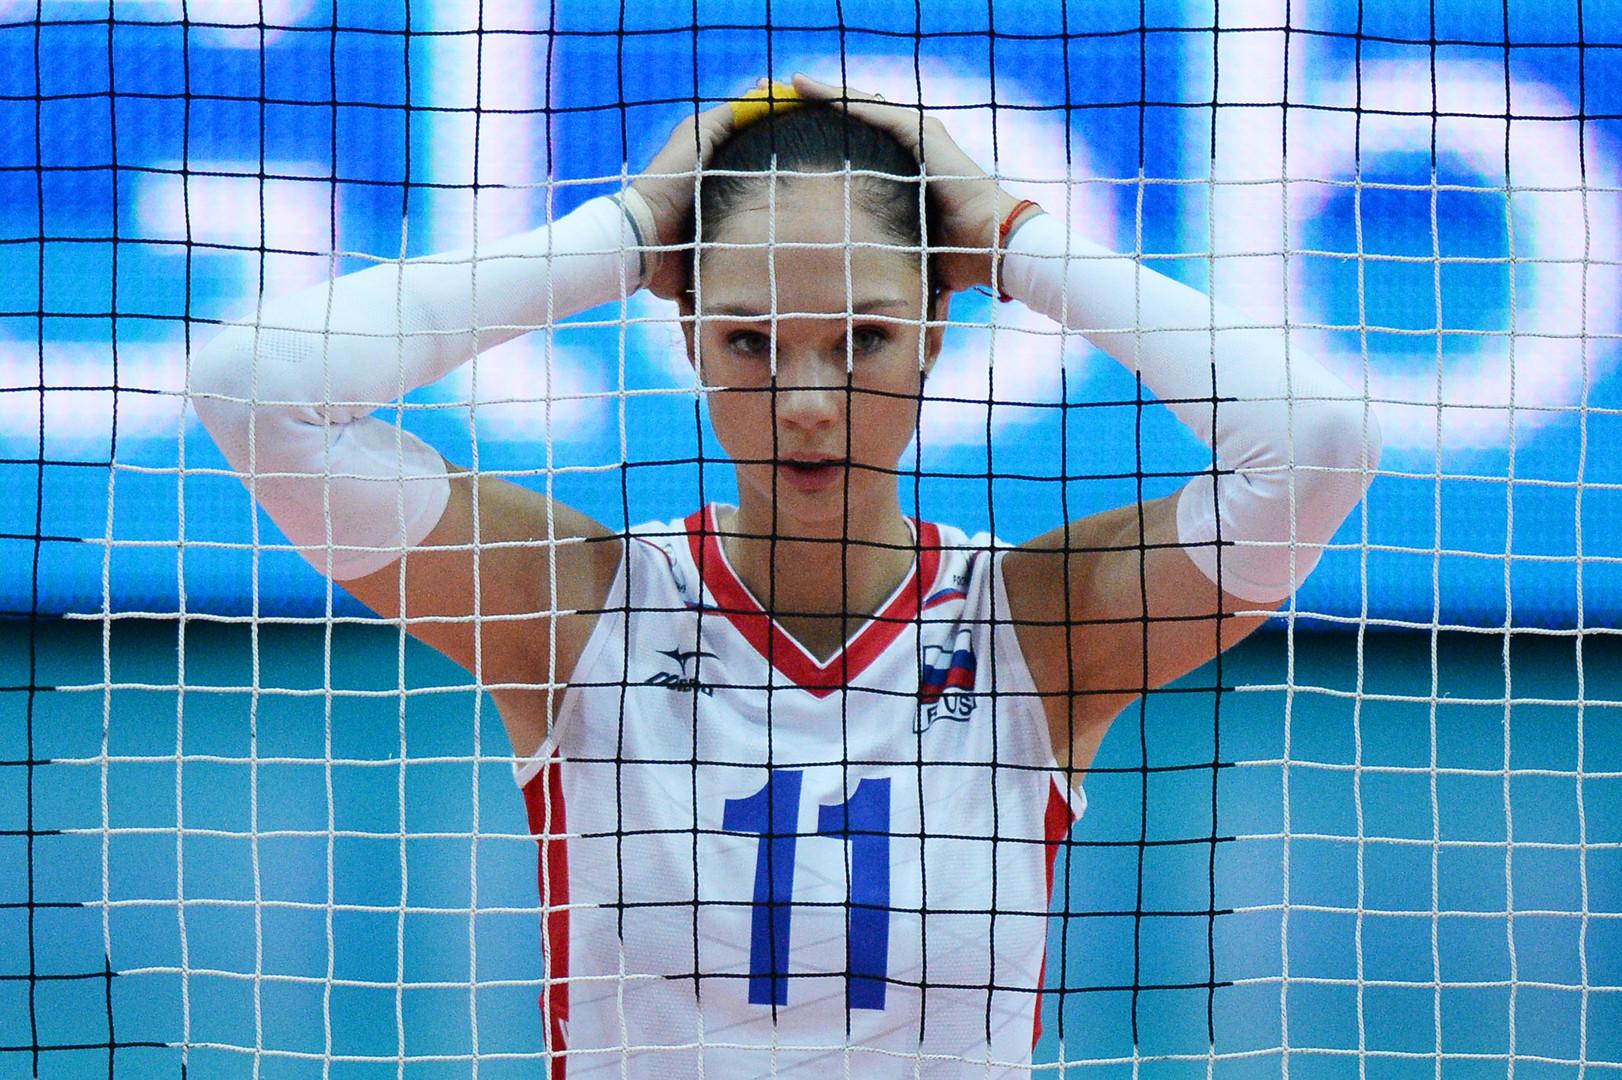 Россиянка Екатерина Гамова-Мукасей в матче Россия – Таиланд чемпионата мира по волейболу в Вероне